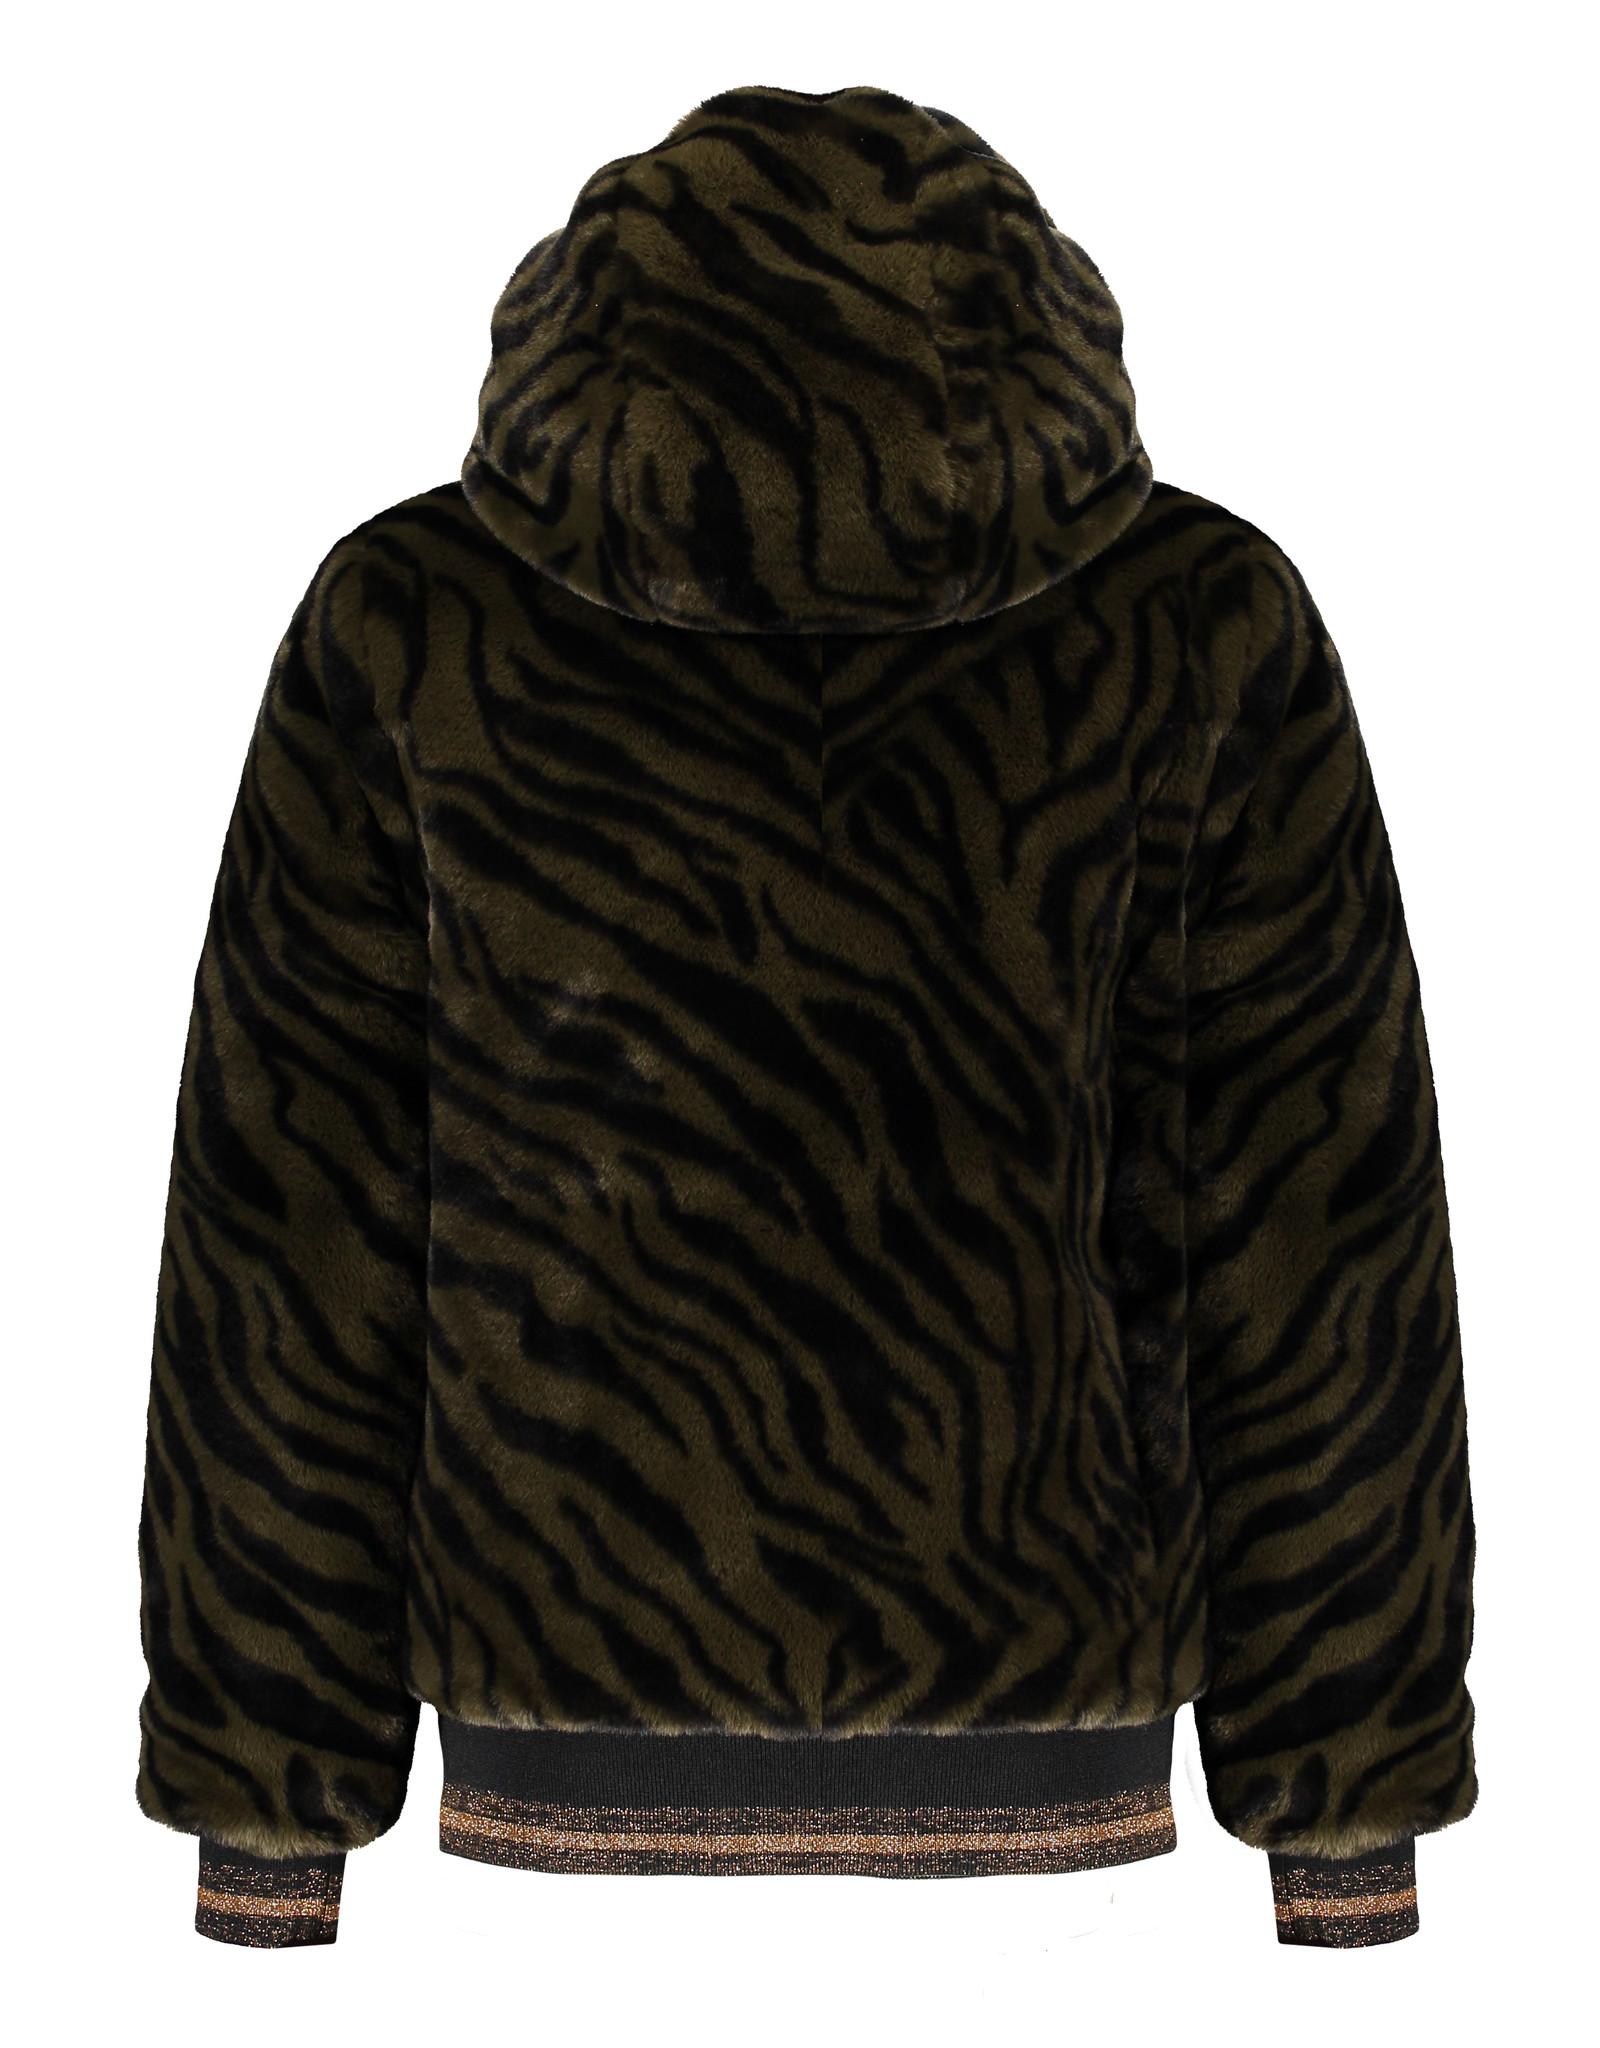 NoBell NoBell Bazz B Zebra furry reversible Army Green